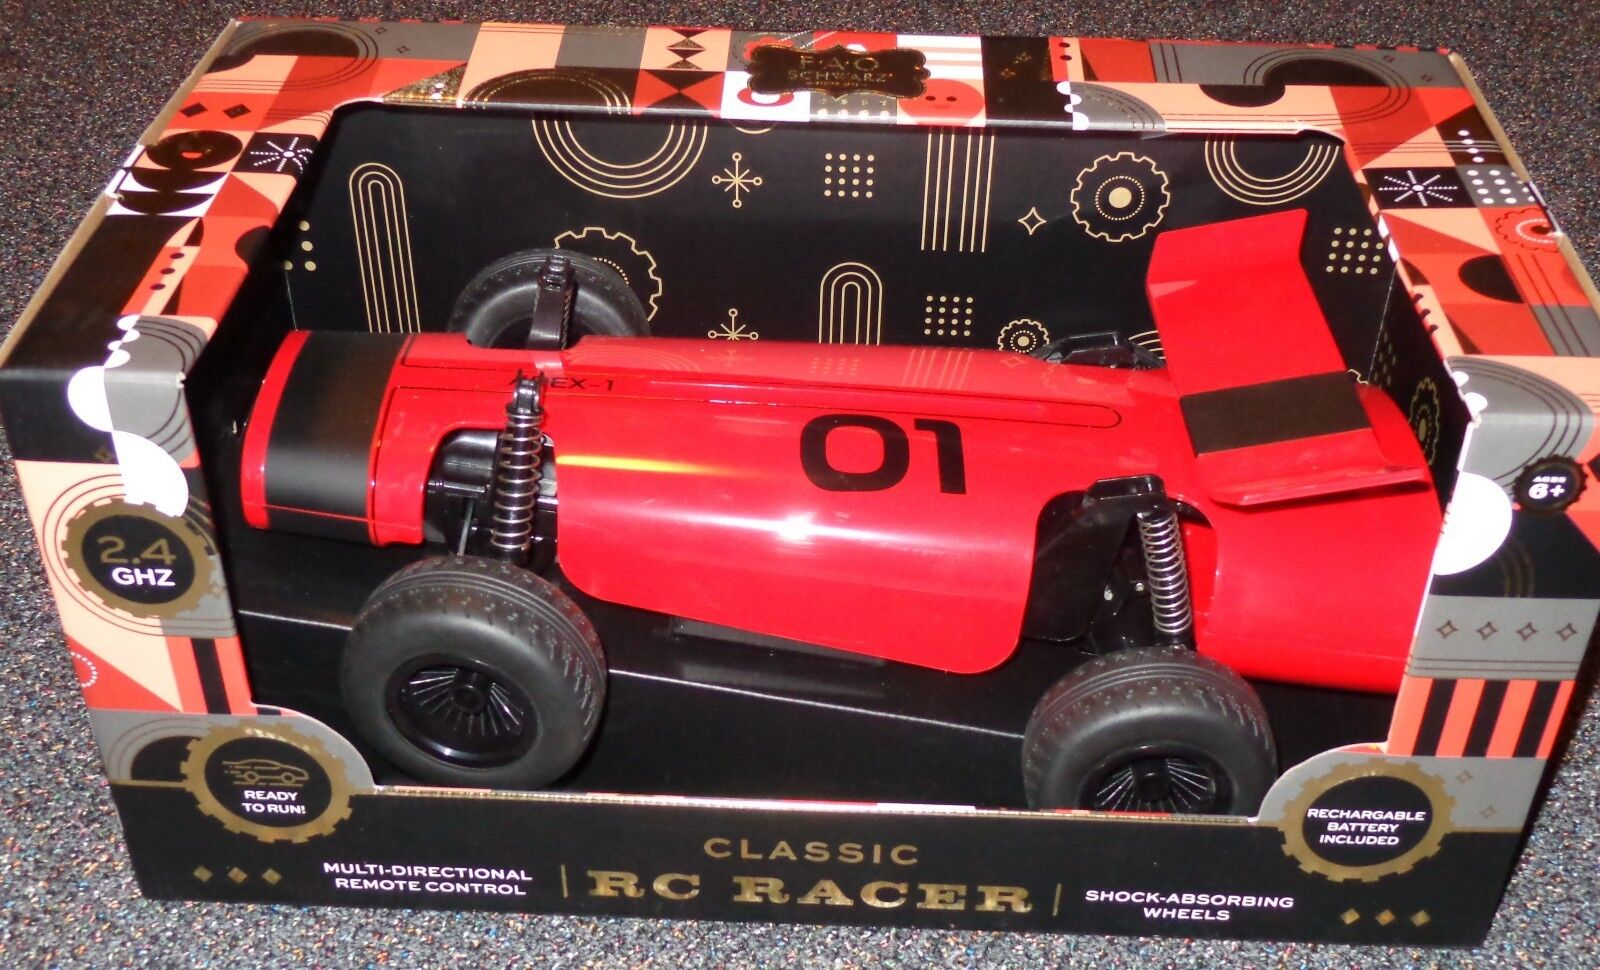 Genuine Authentic Apex 1 Remote Control Car by FAO black NEW - Retail  99